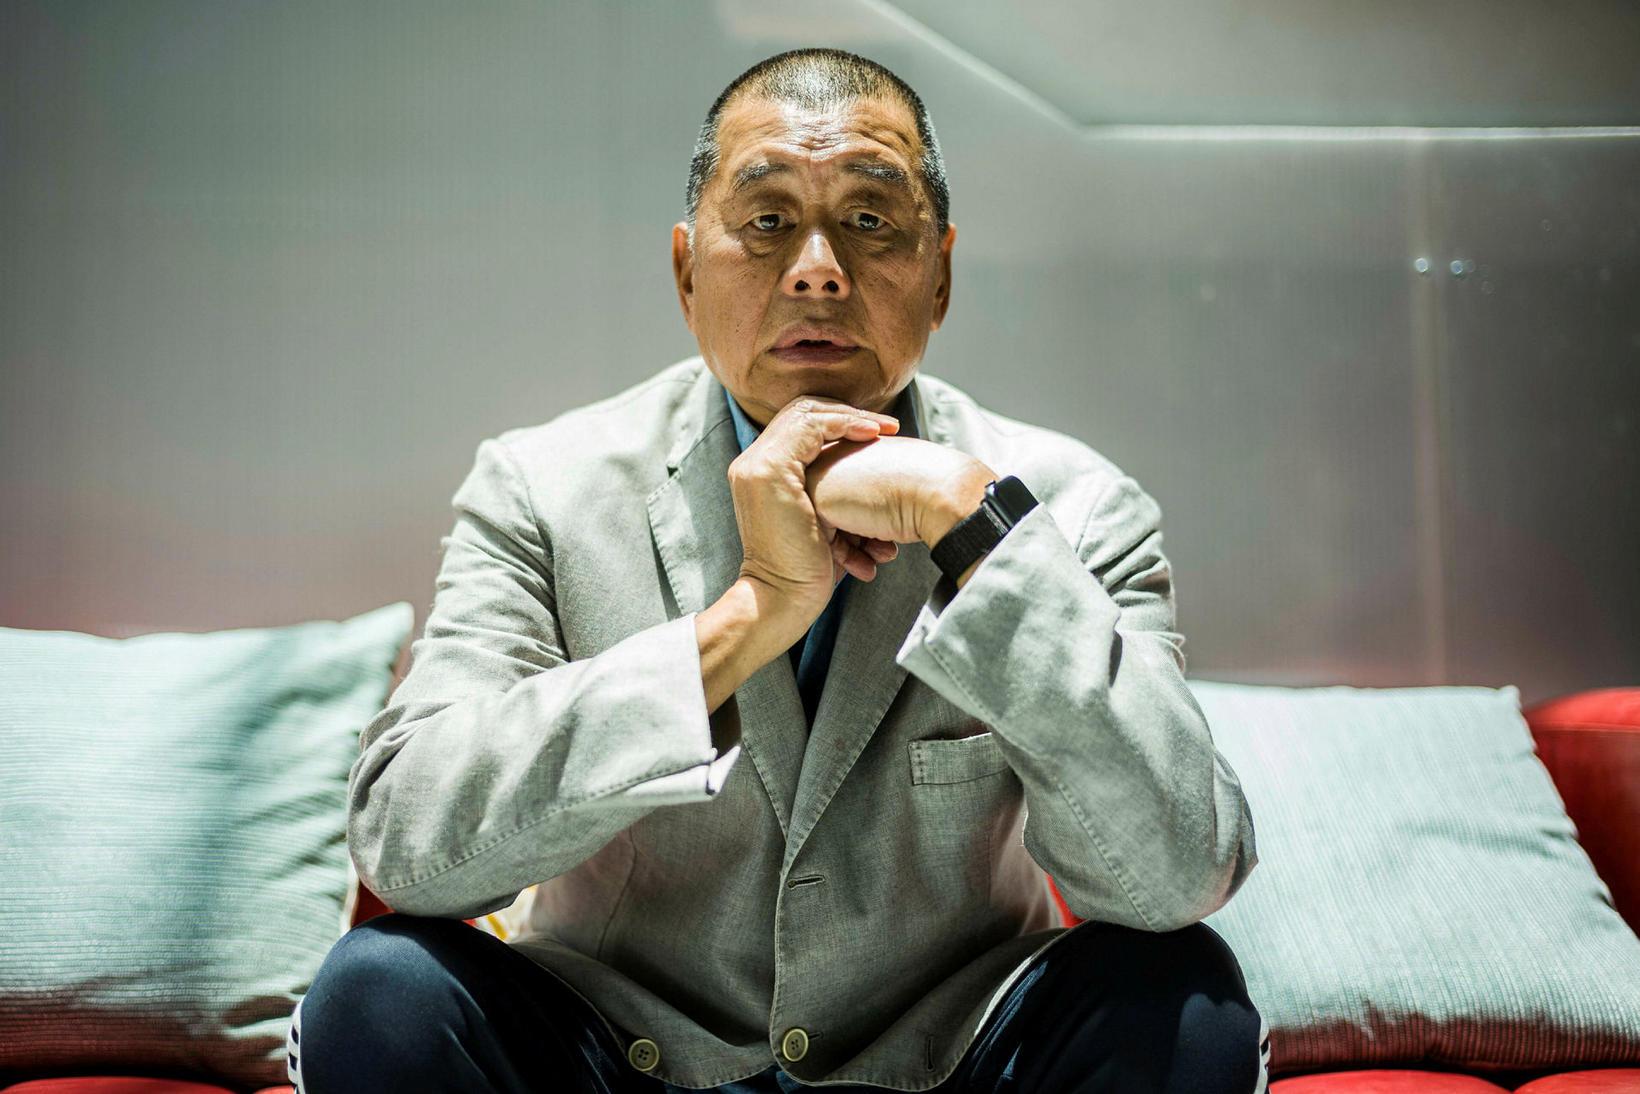 Jimmy Lai.